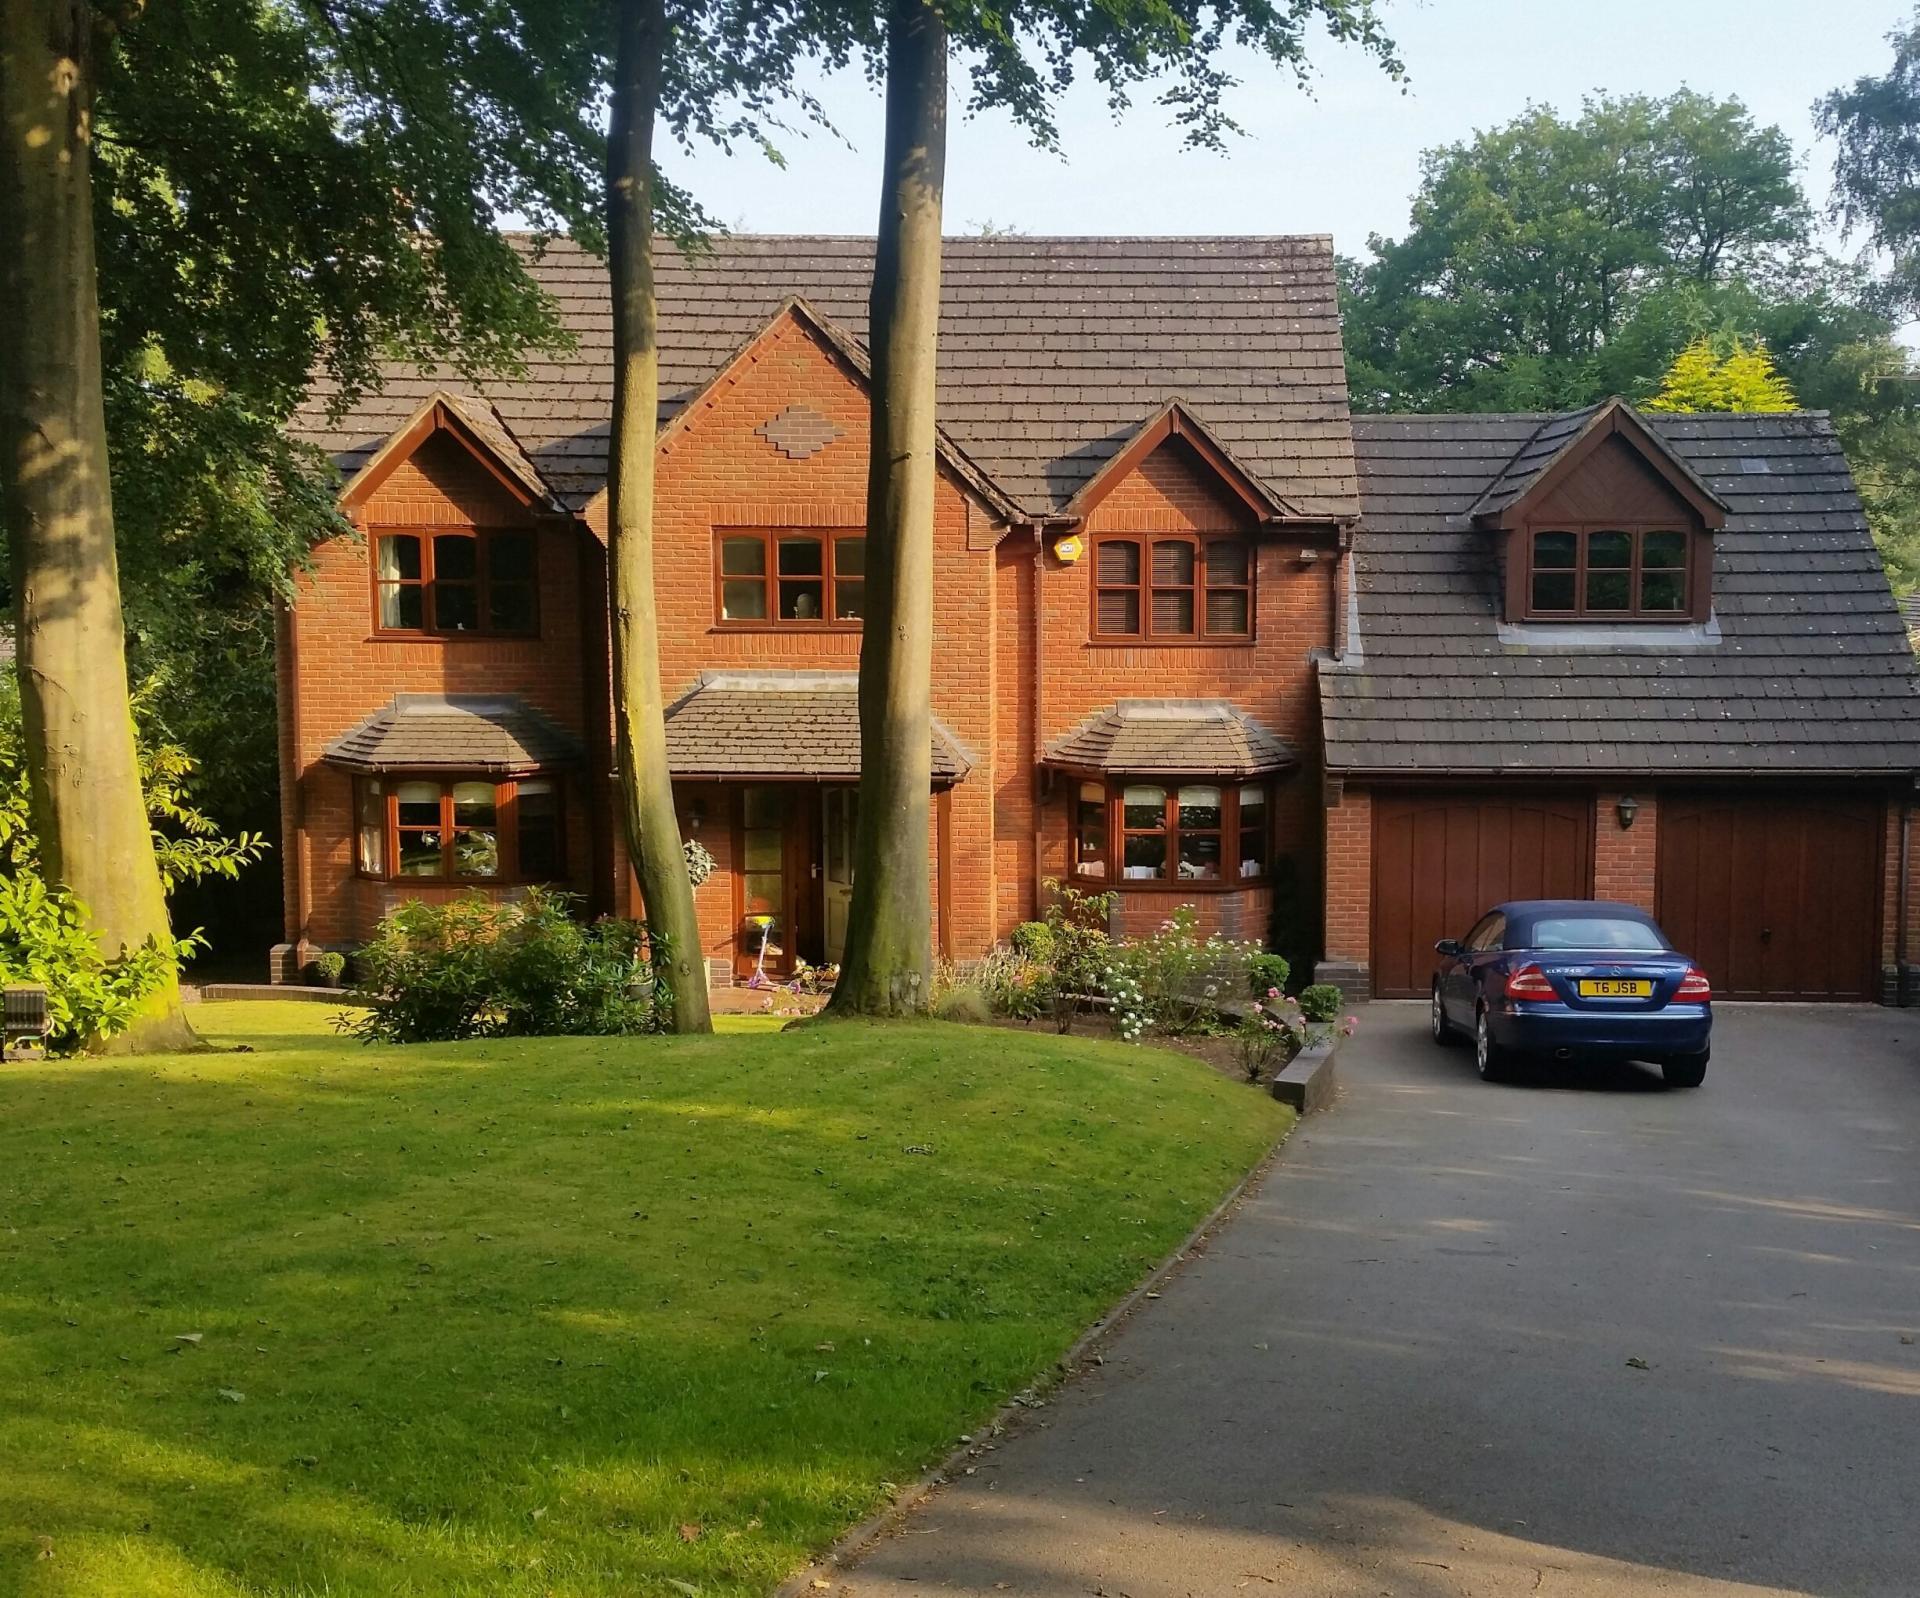 5 Bedroom House For Sale In Market Drayton